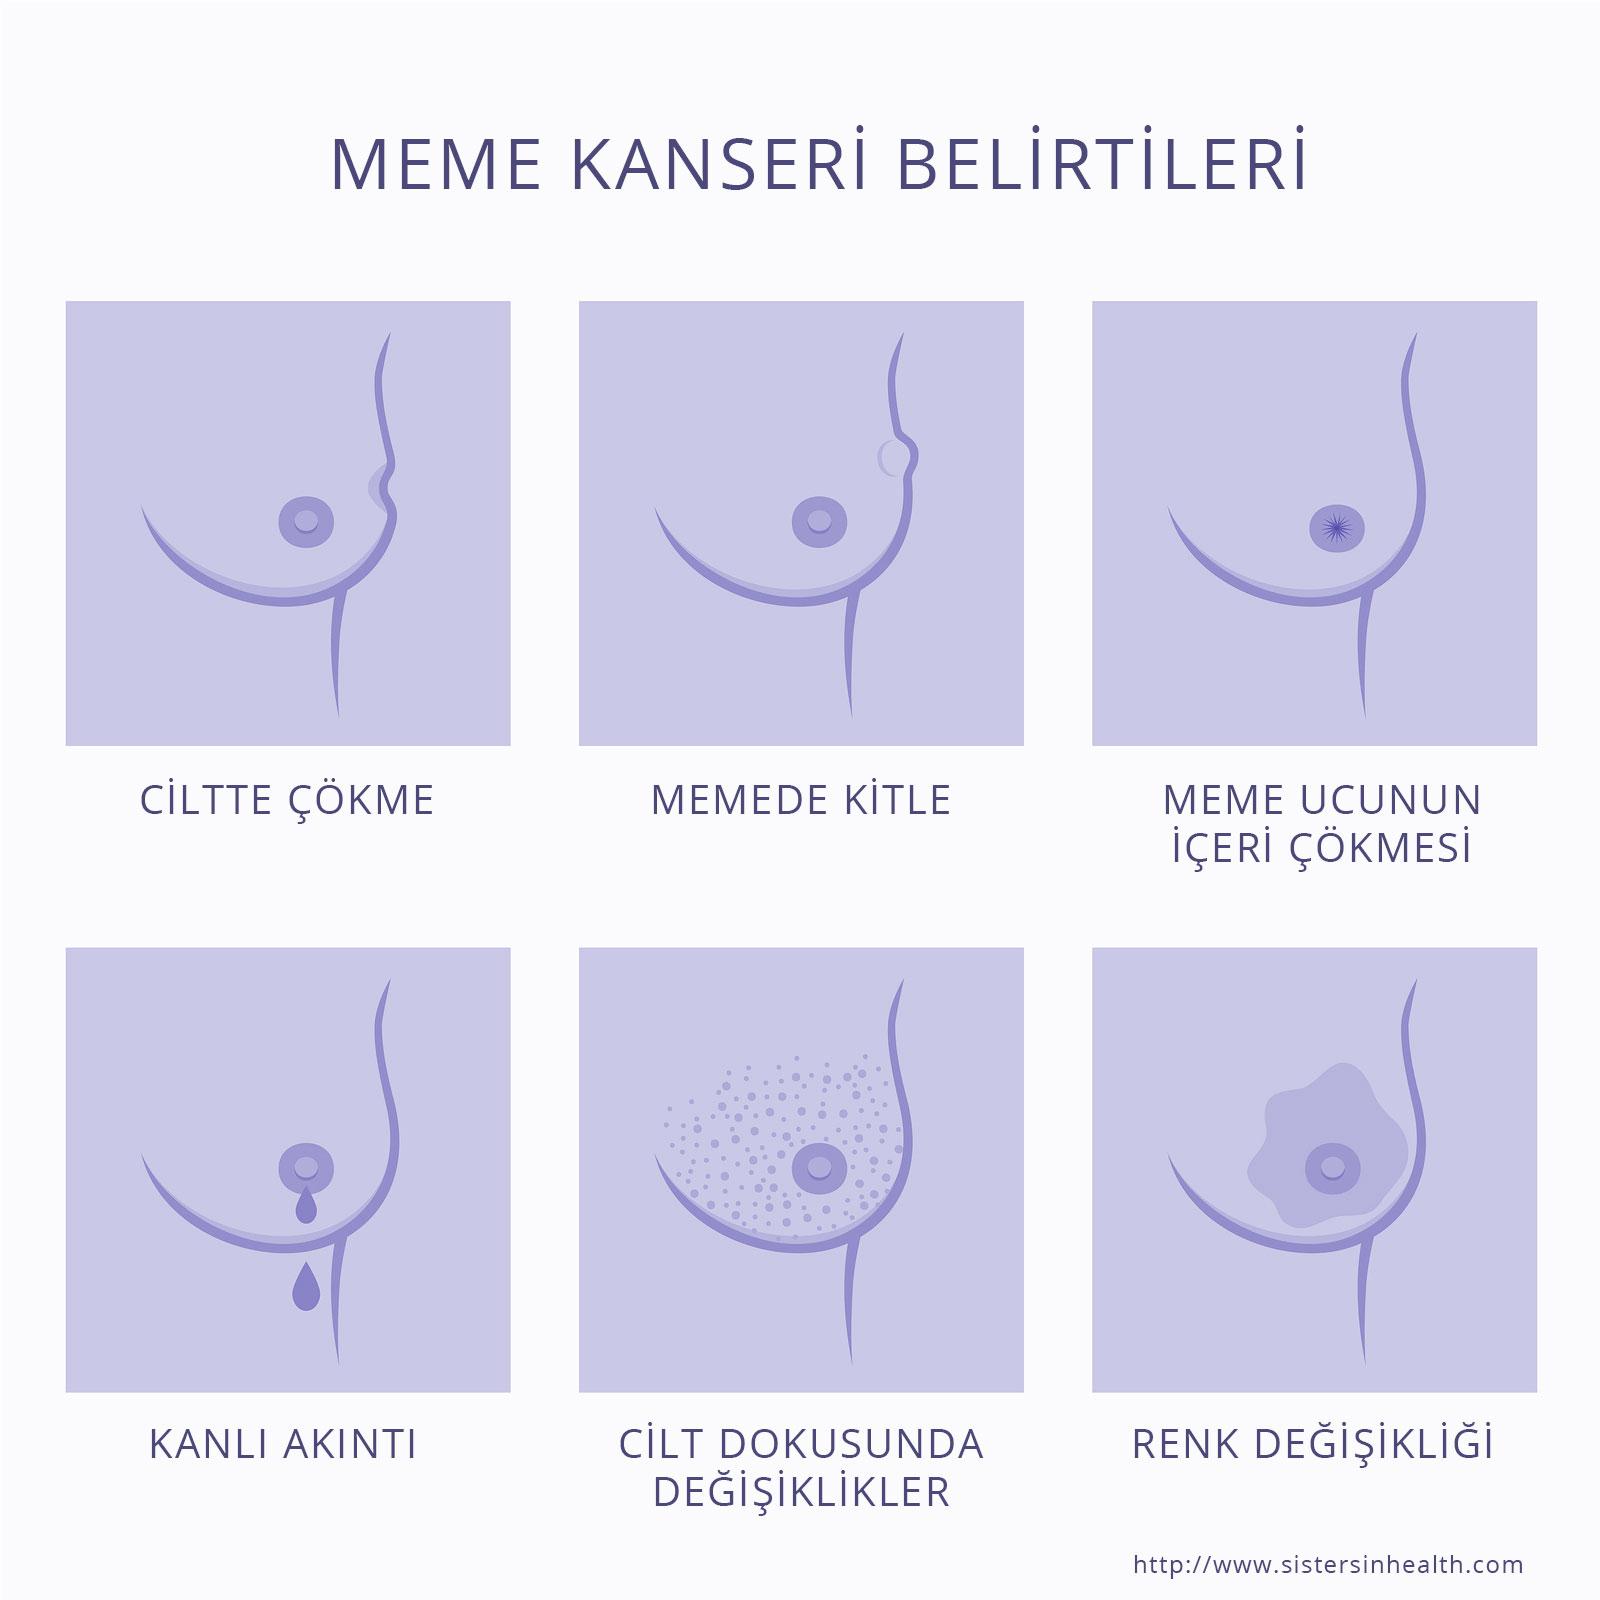 Meme kanseri belirtileri - Prof. Dr. Abut Kebudi